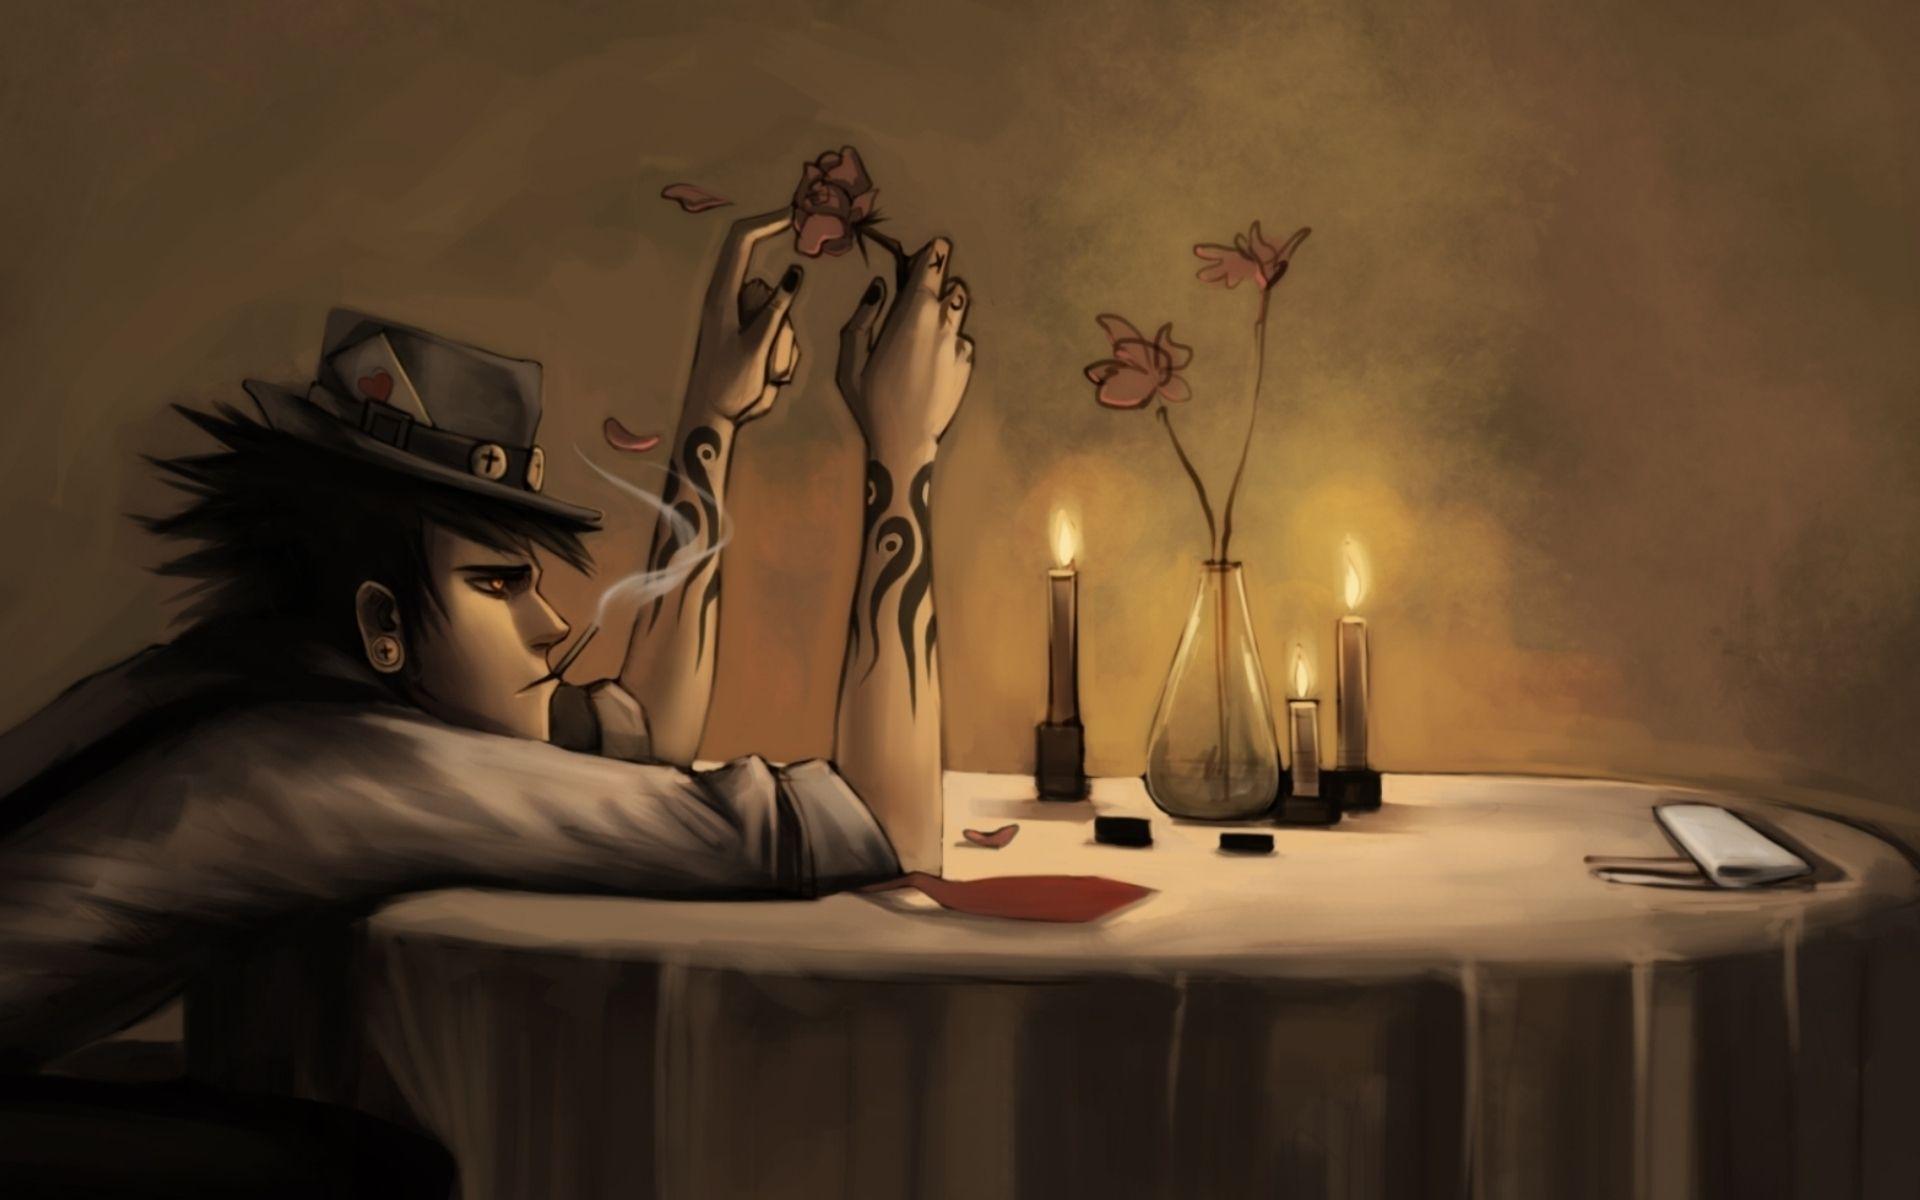 фэнтези одиночество картинки муж уходил войну